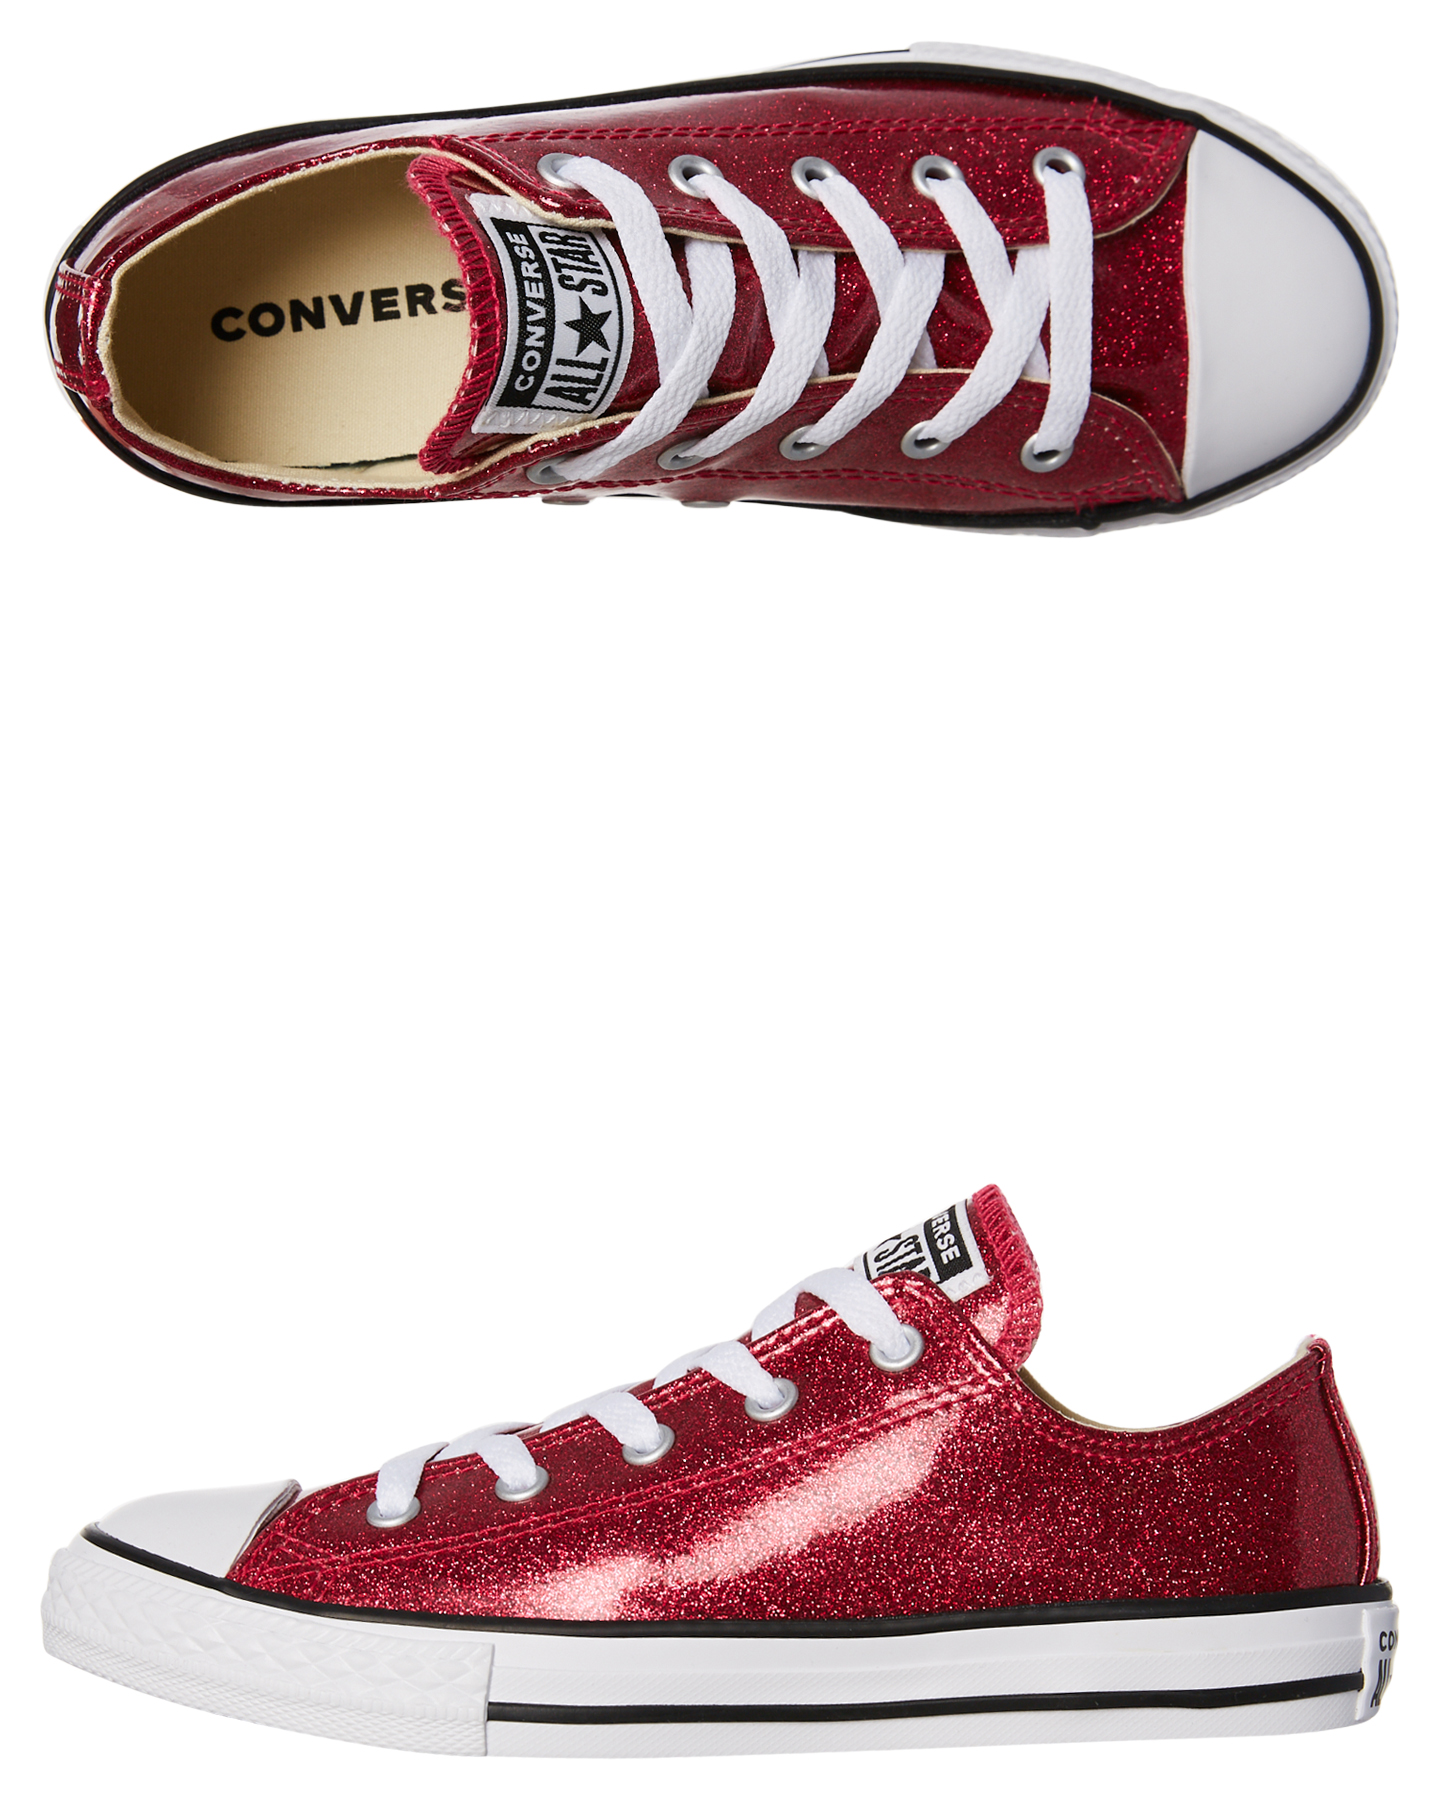 a43db9e86f3 Converse Kids Chuck Taylor All Star Glitter Sneaker Pink Pop Womens ...